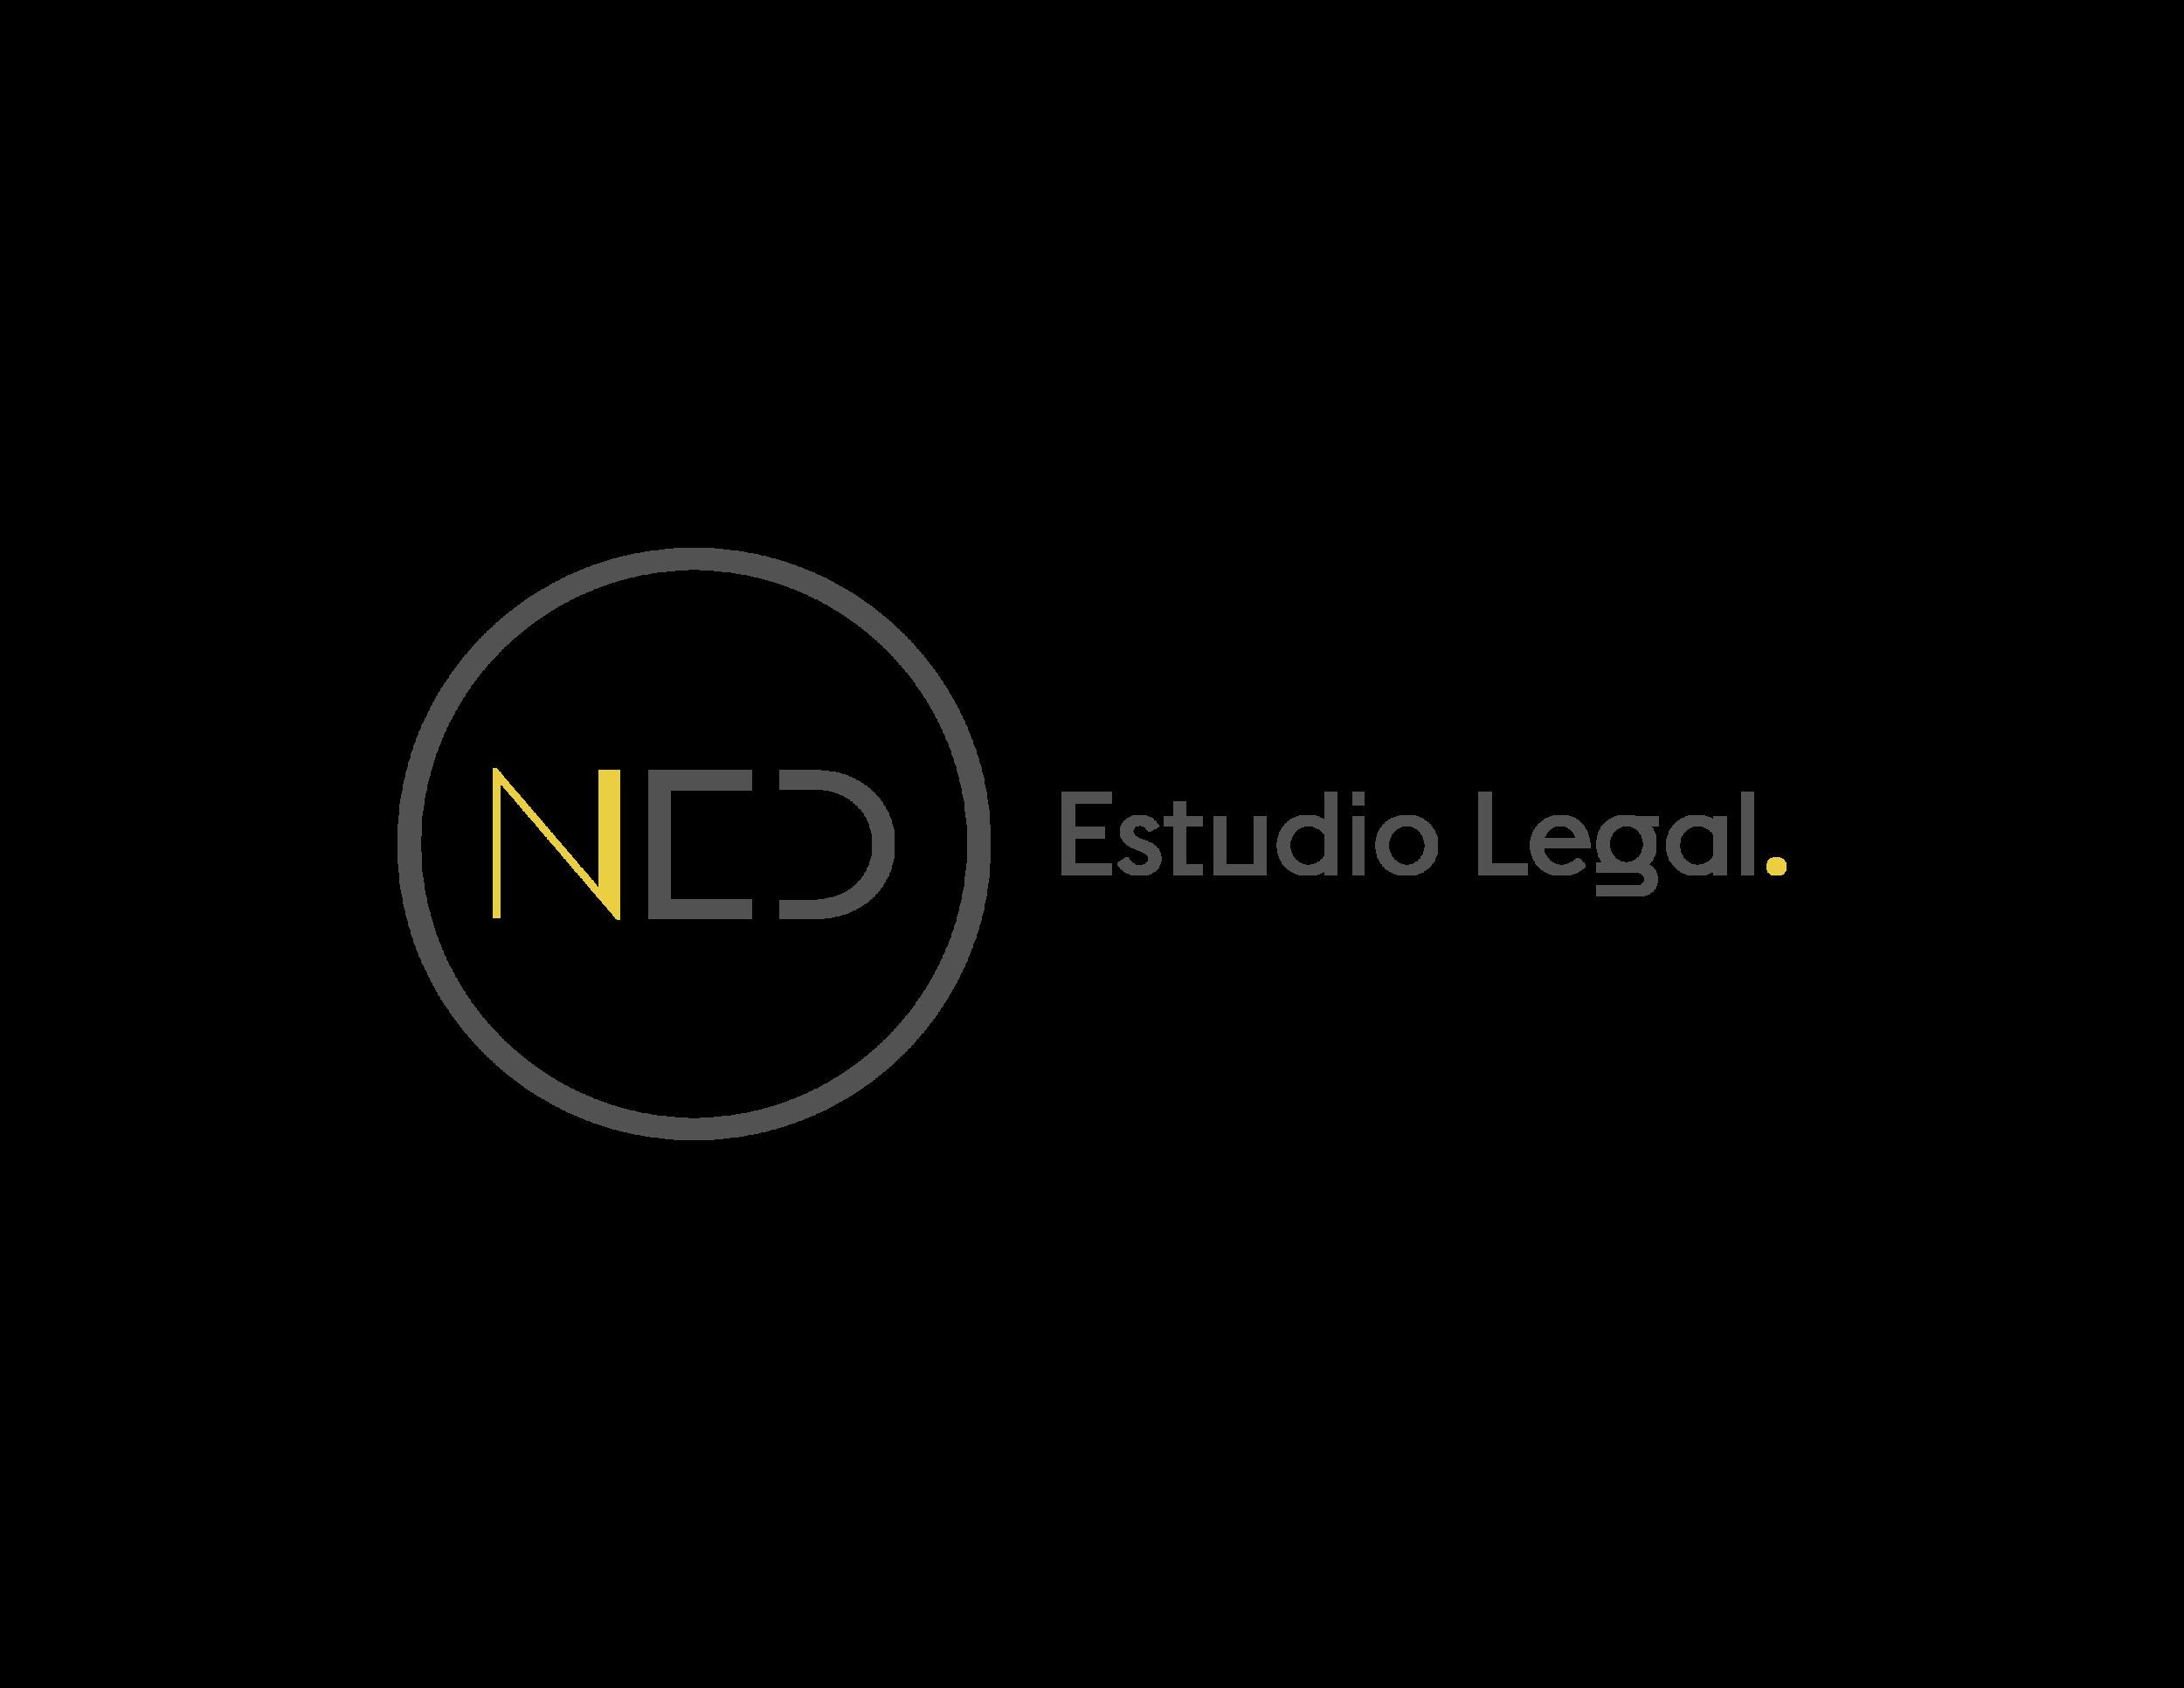 NCD Asesores - Estudio Legal en Bogotá